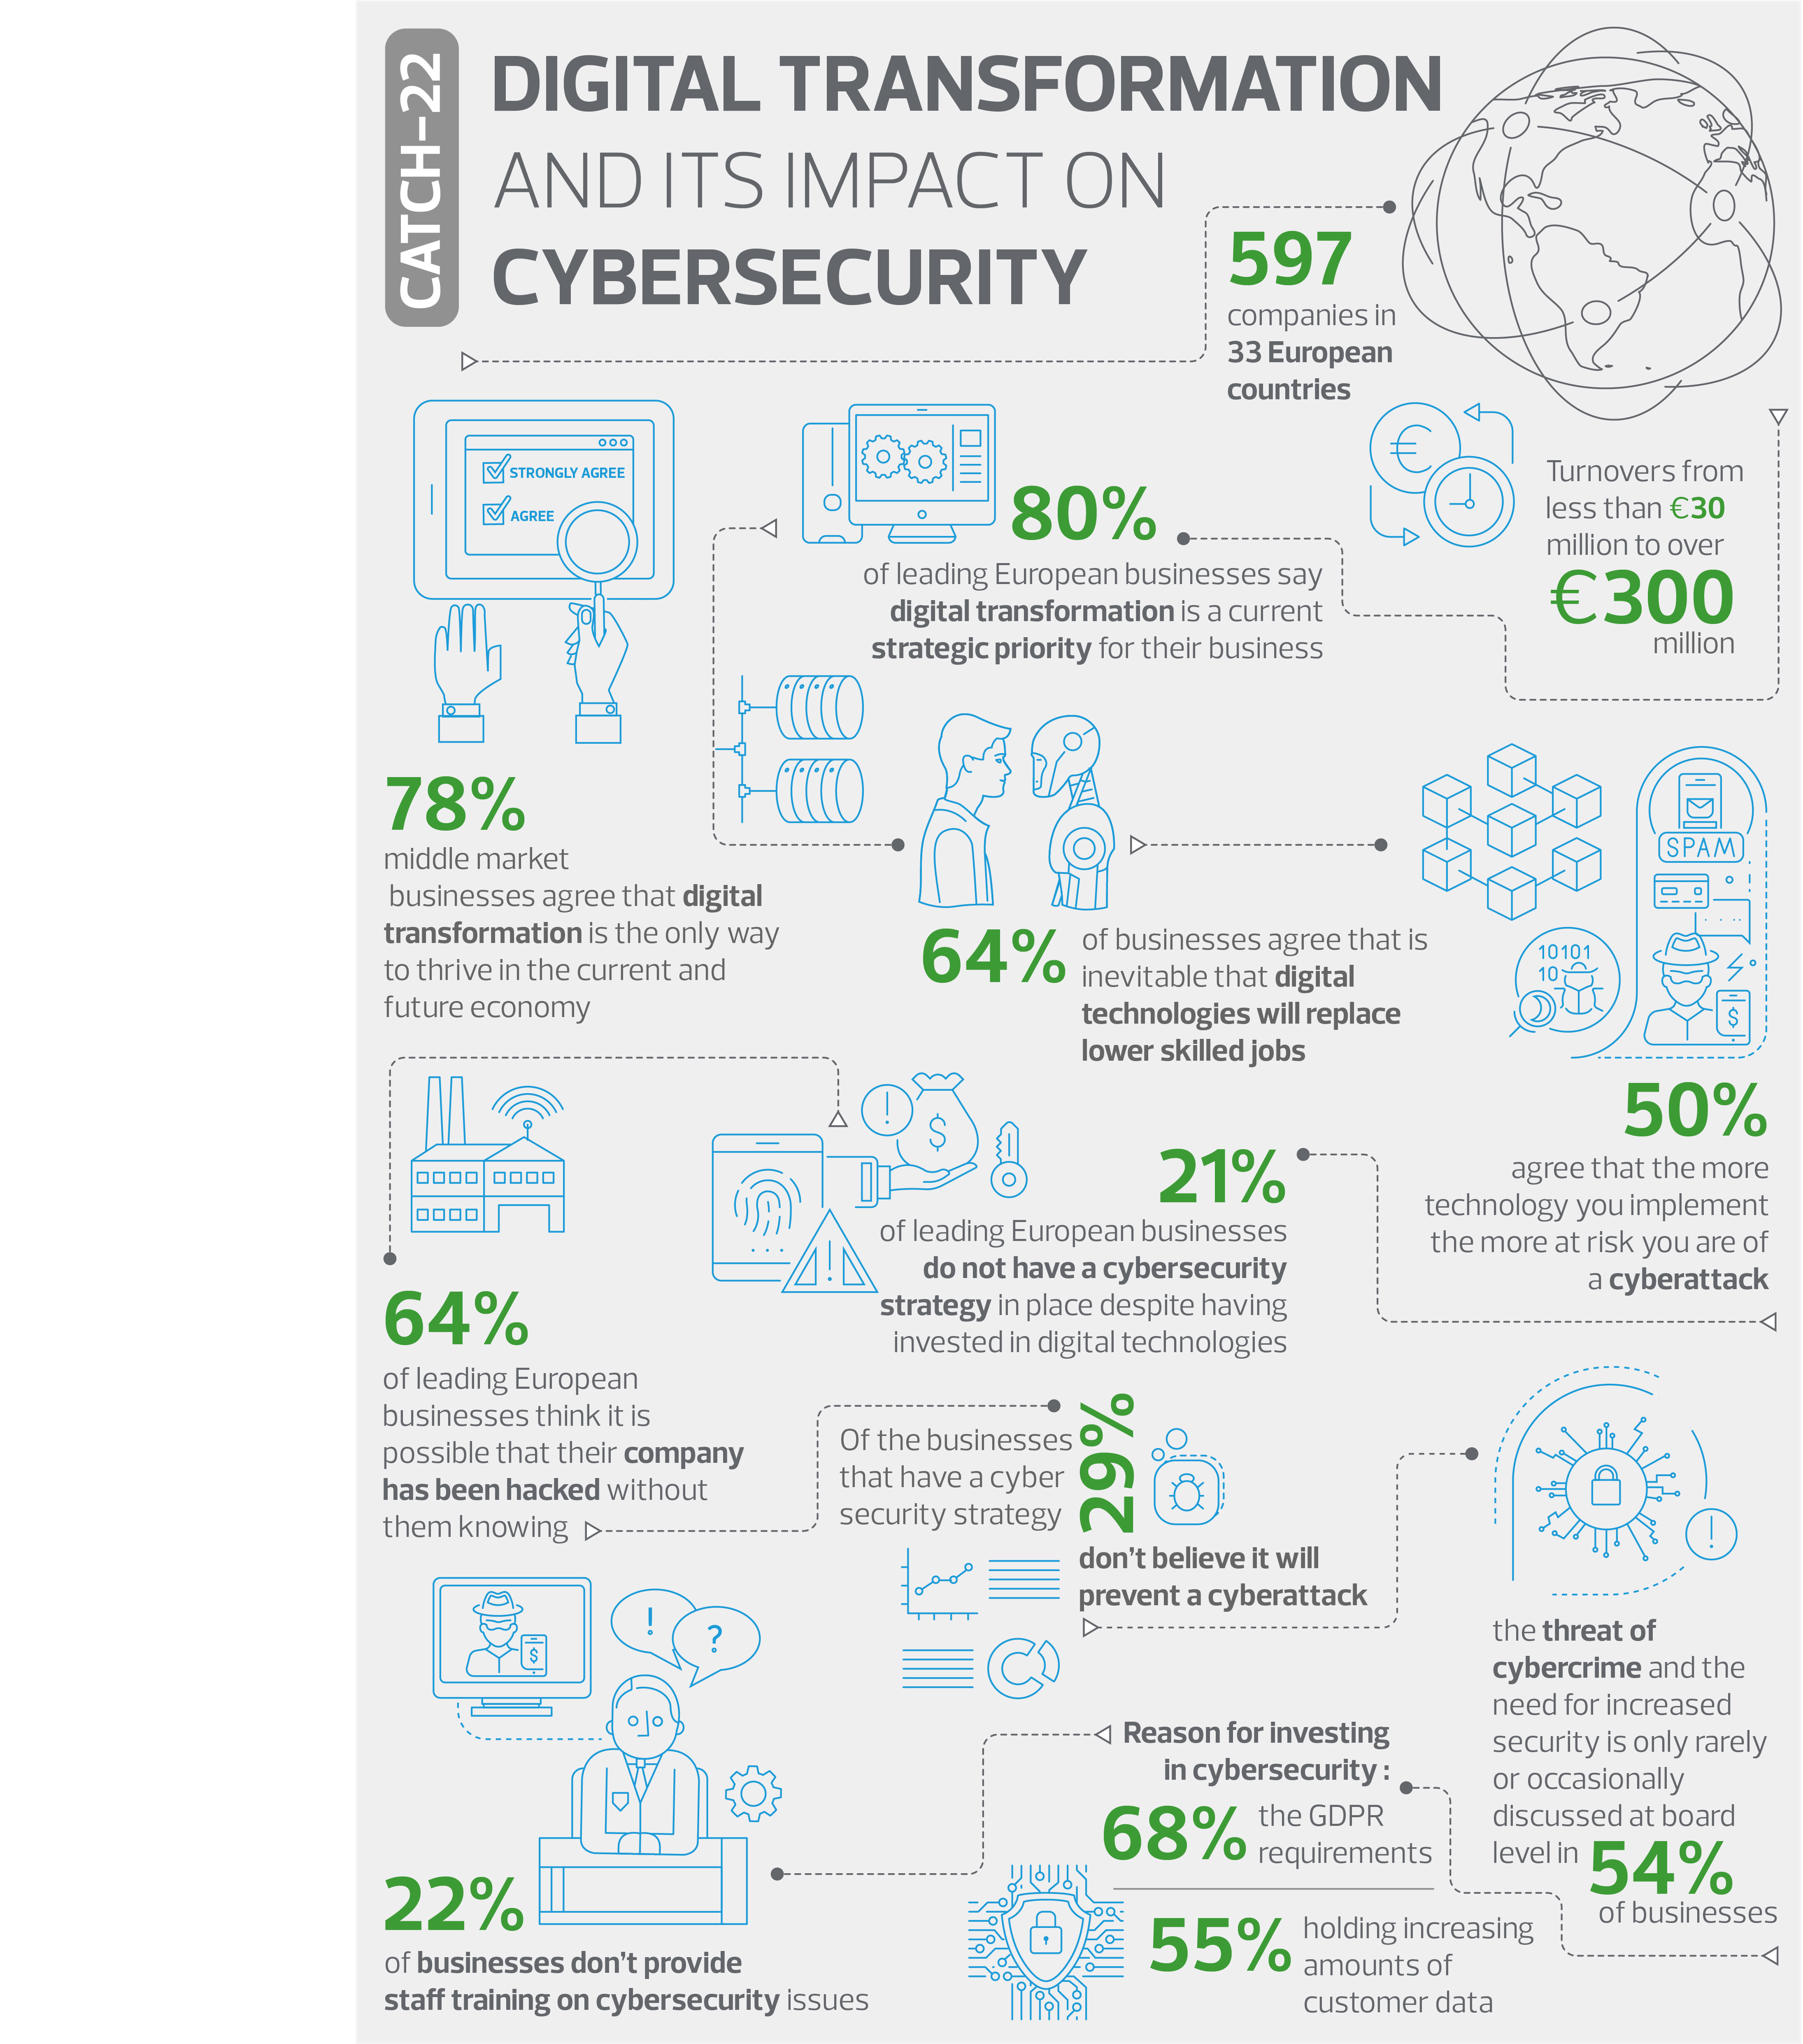 digital_transformation_and_cybersecurity_rgb.jpg